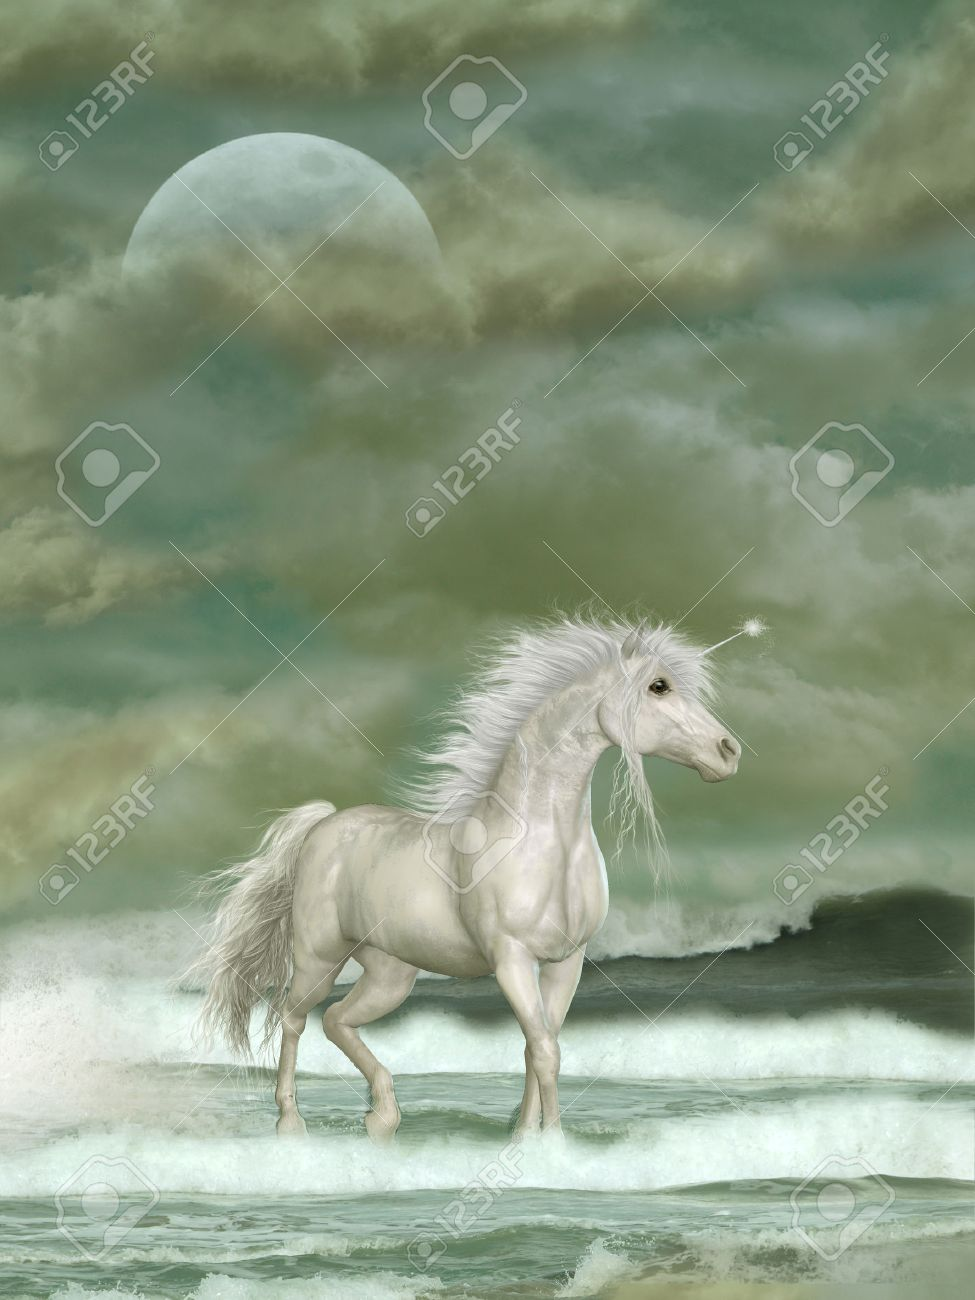 Fantasy white unicorn in the ocean with big moon fantasy white unicorn in the ocean with big moon 29138758 voltagebd Images